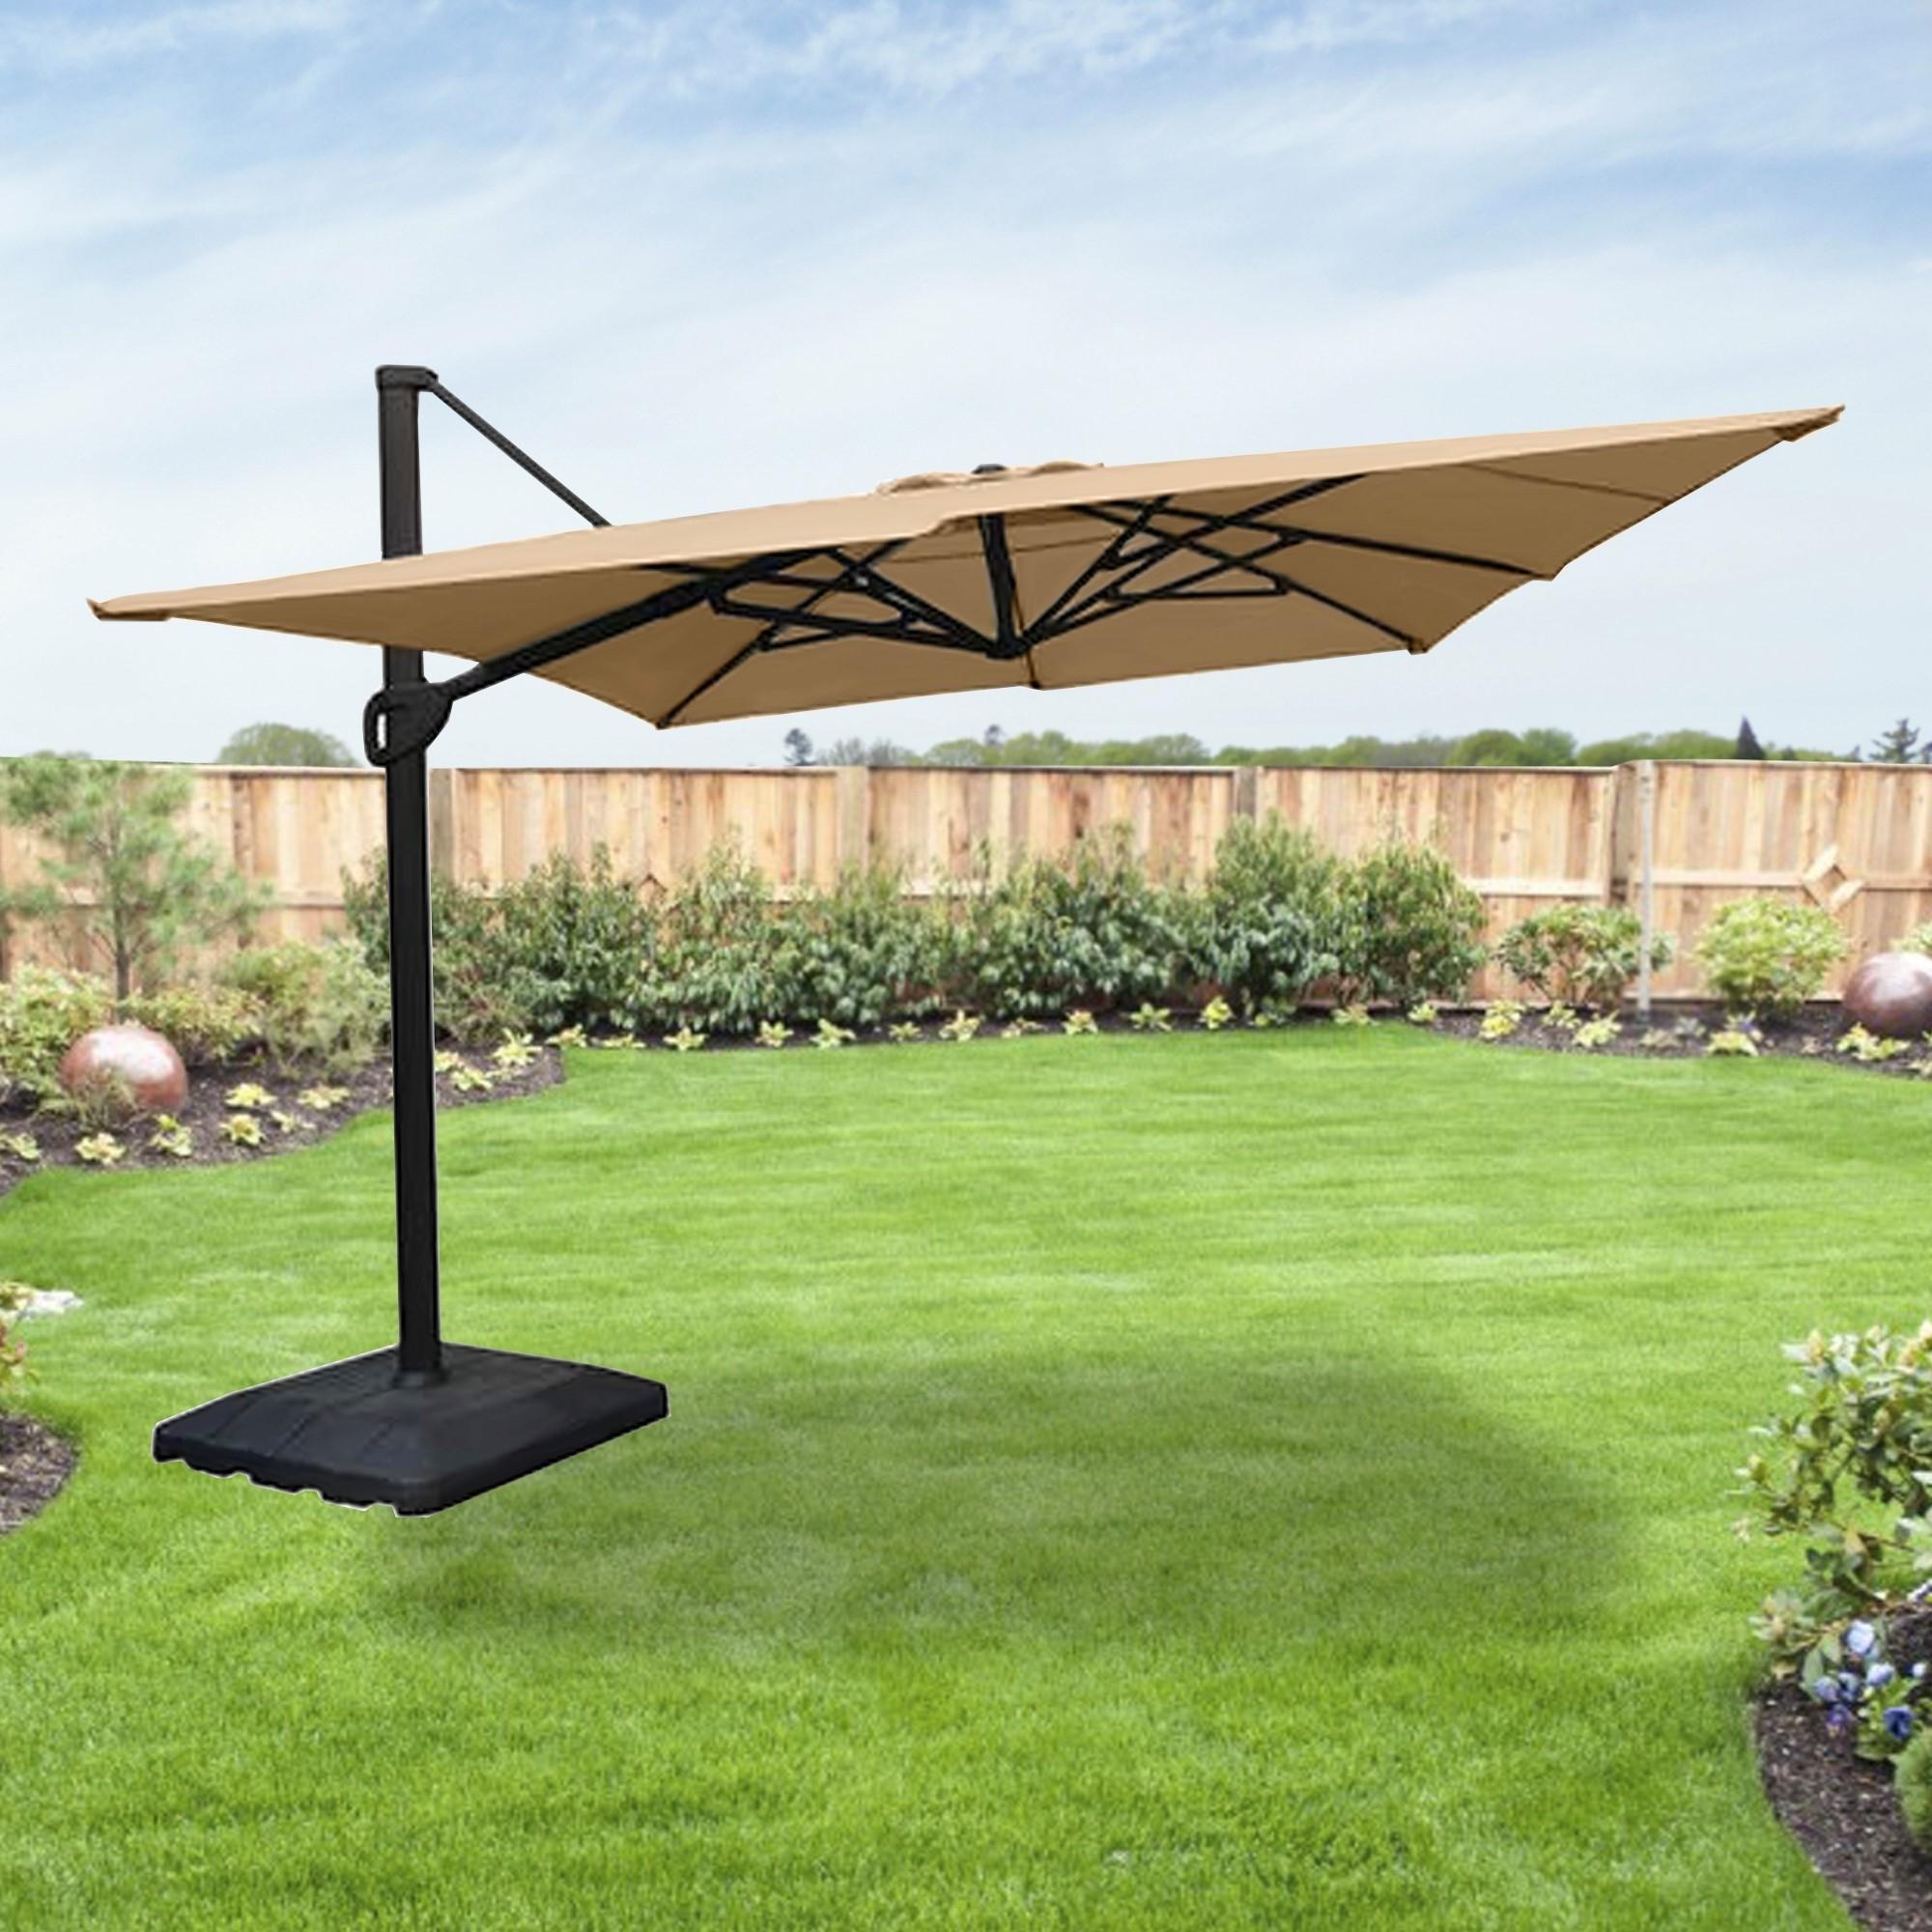 Most Current Menards Patio Umbrellas In Replacement Umbrella Canopy – Garden Winds (View 10 of 20)